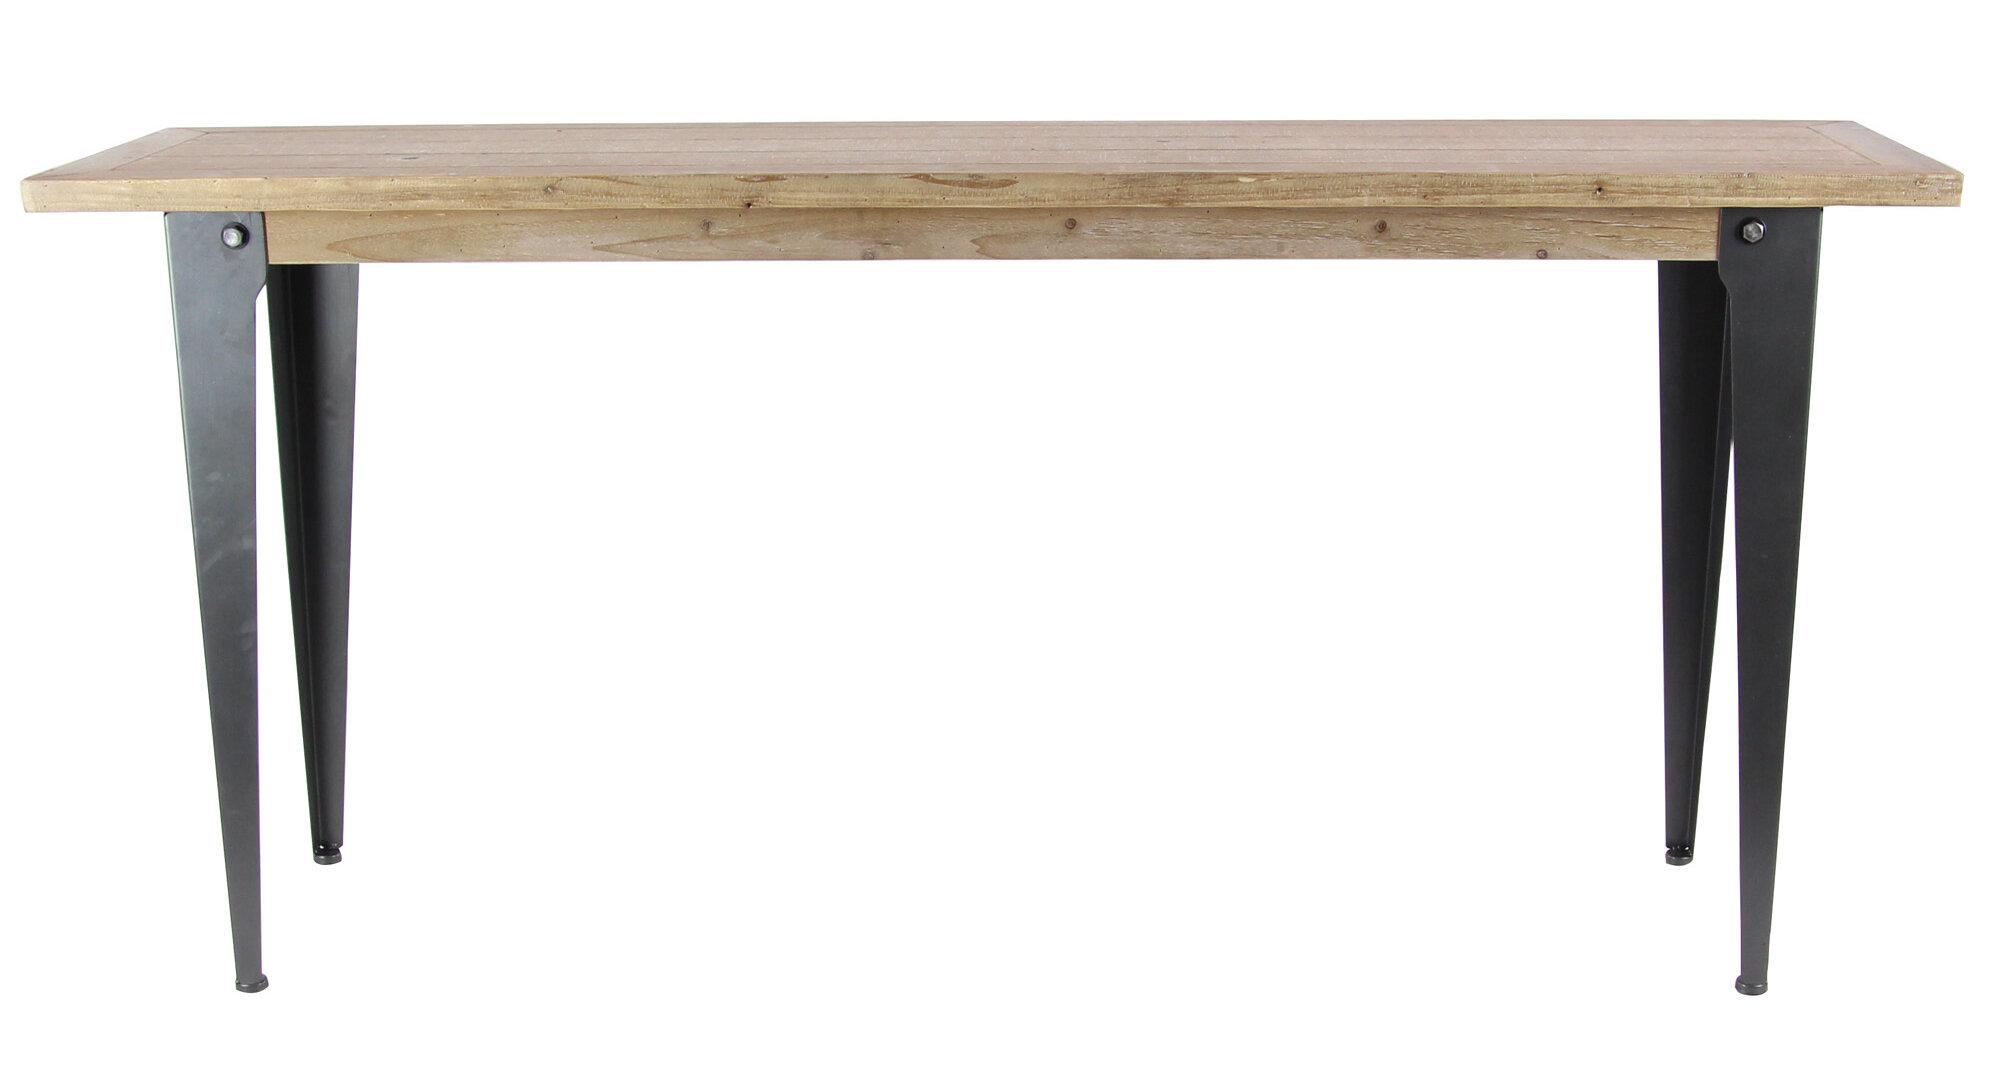 Williston forge laffoon rustic console table wayfair